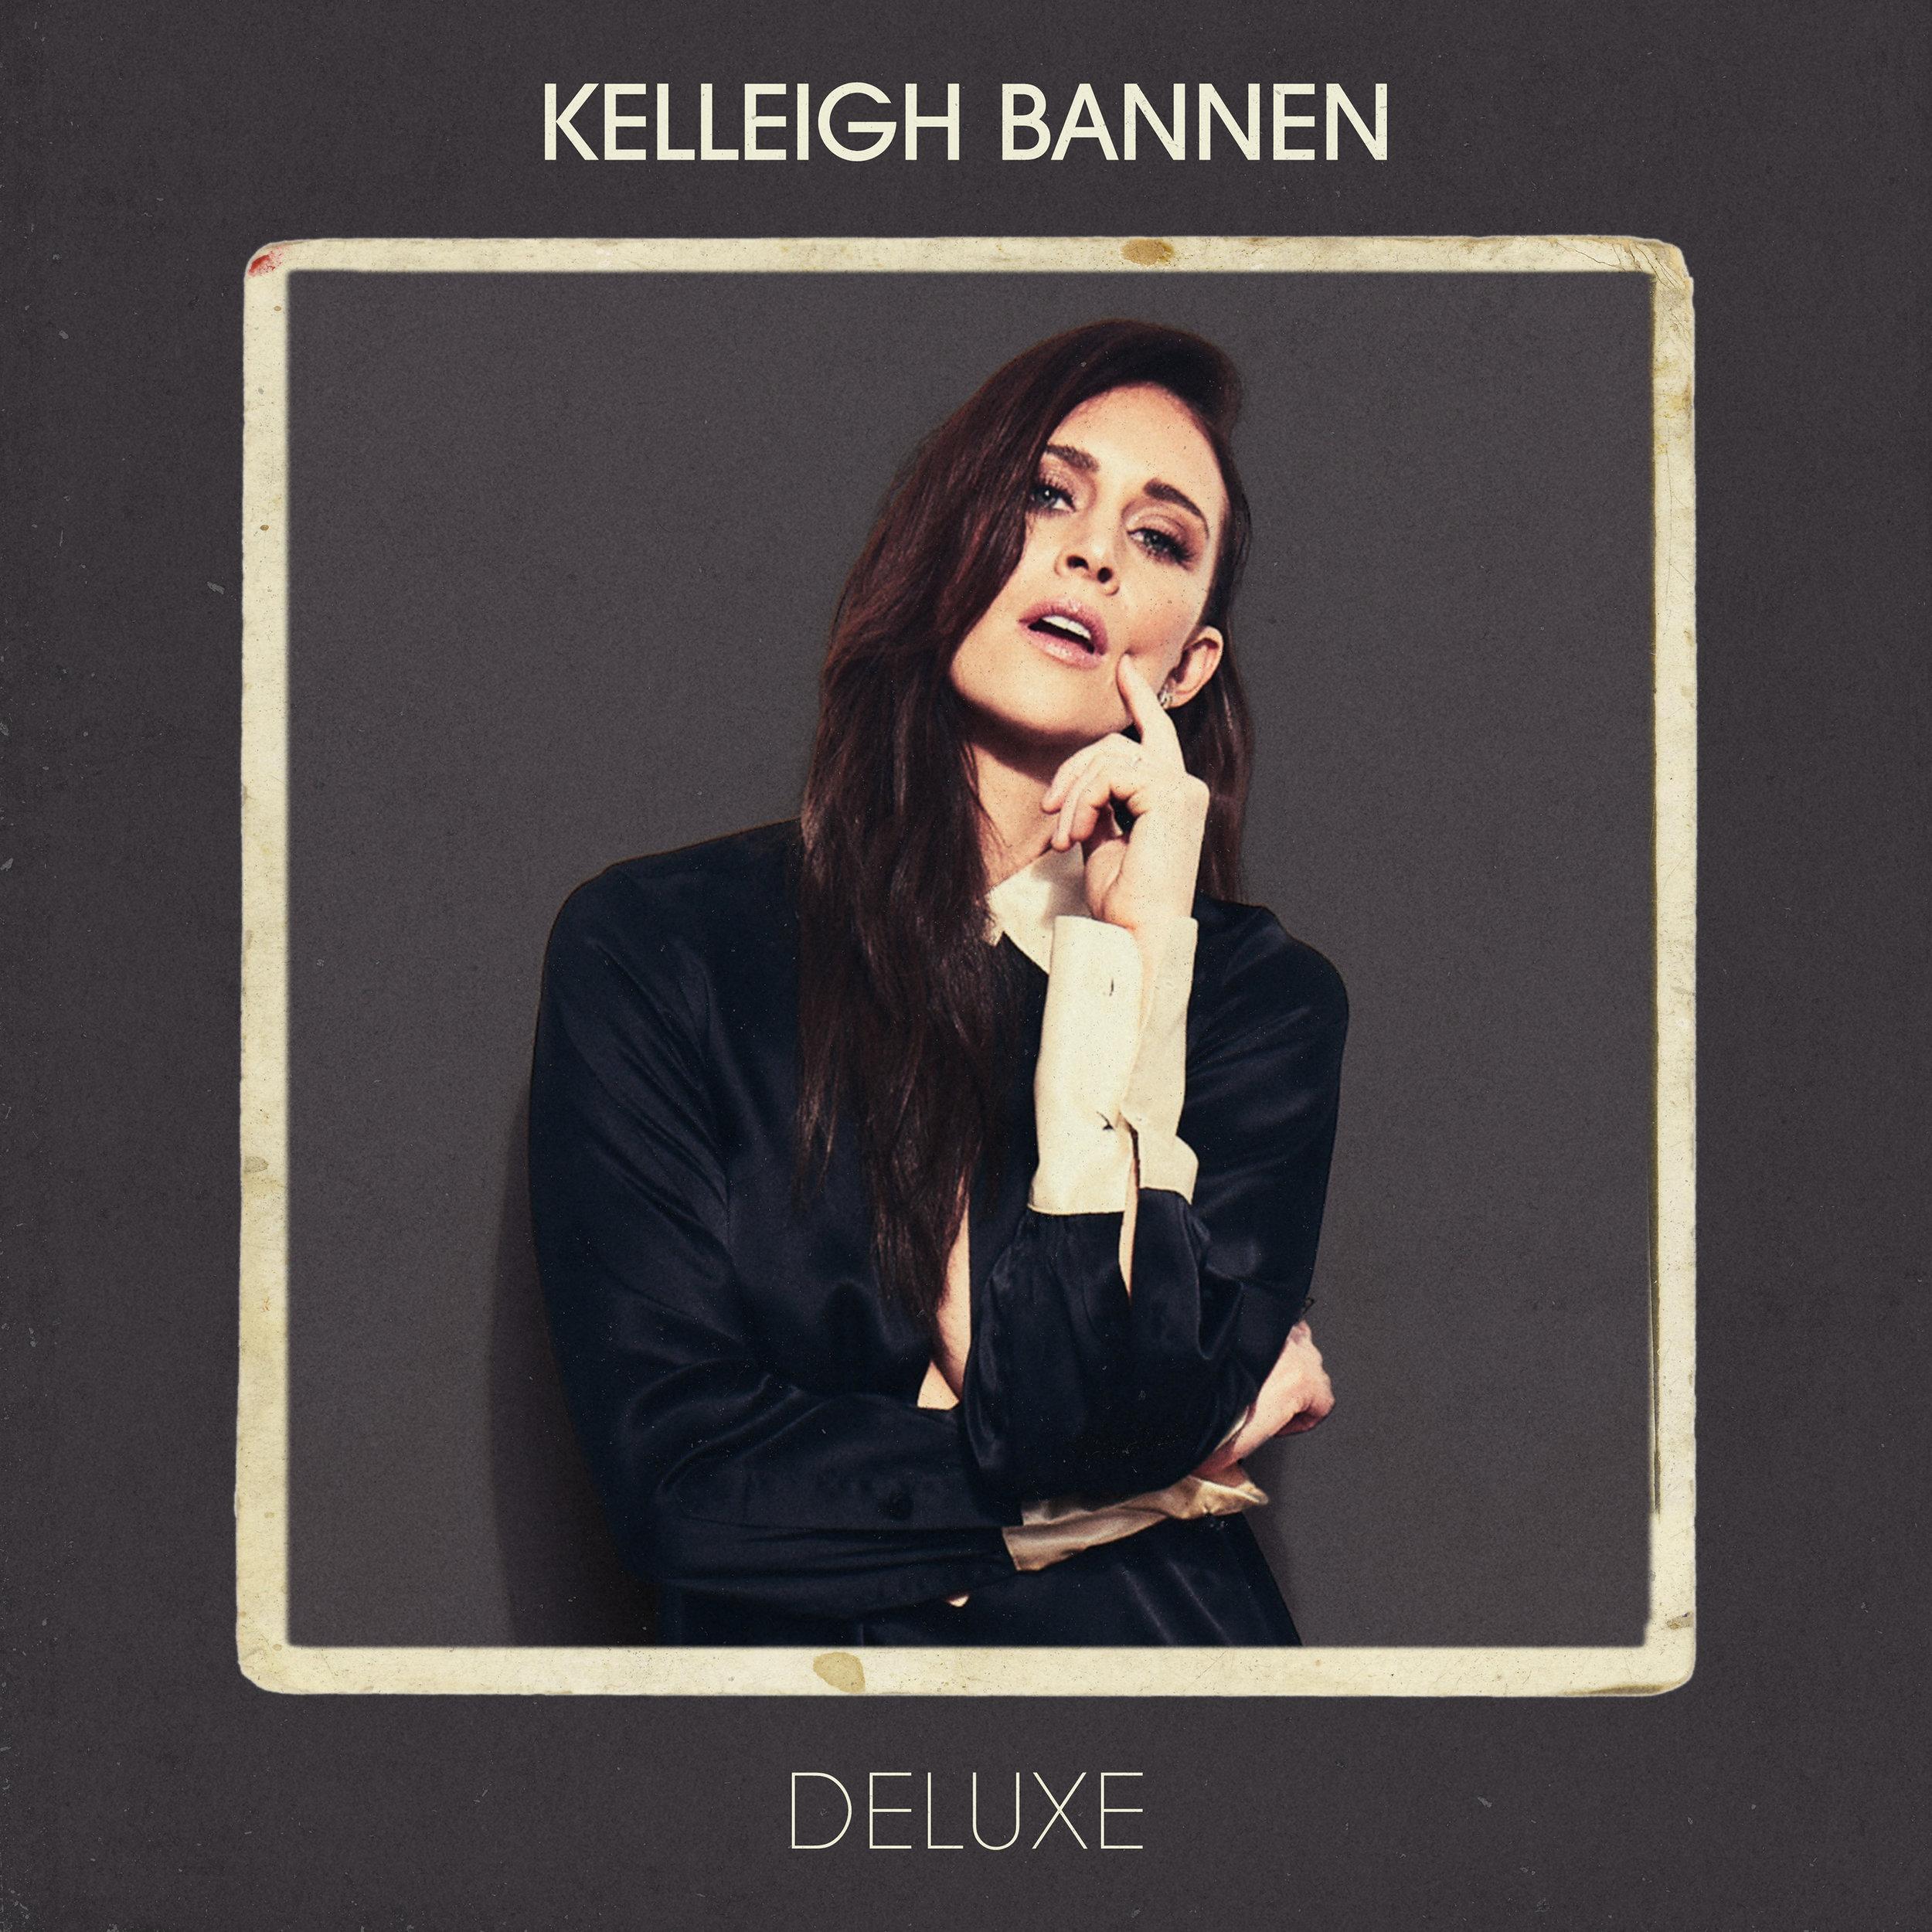 KELLEIGH_BANNEN-DELUXE.jpg